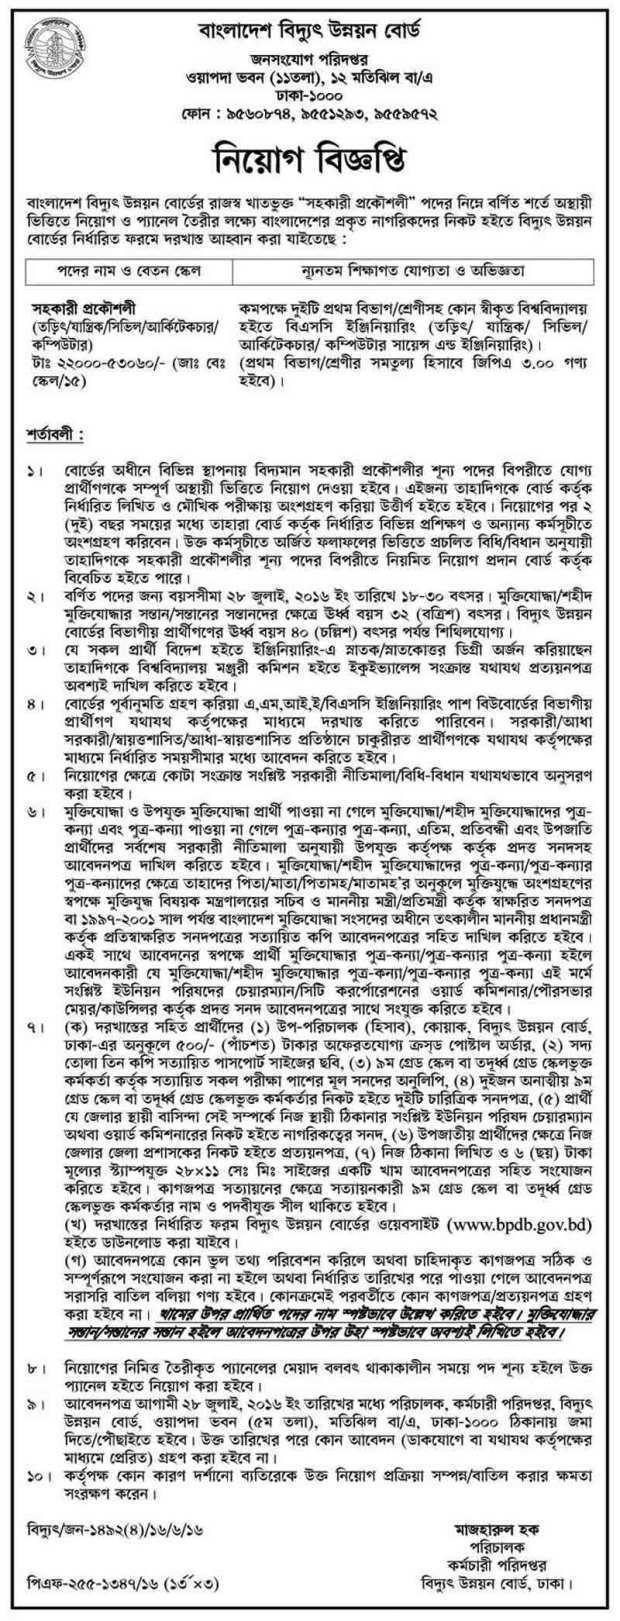 Bangladesh Power Development Board Job